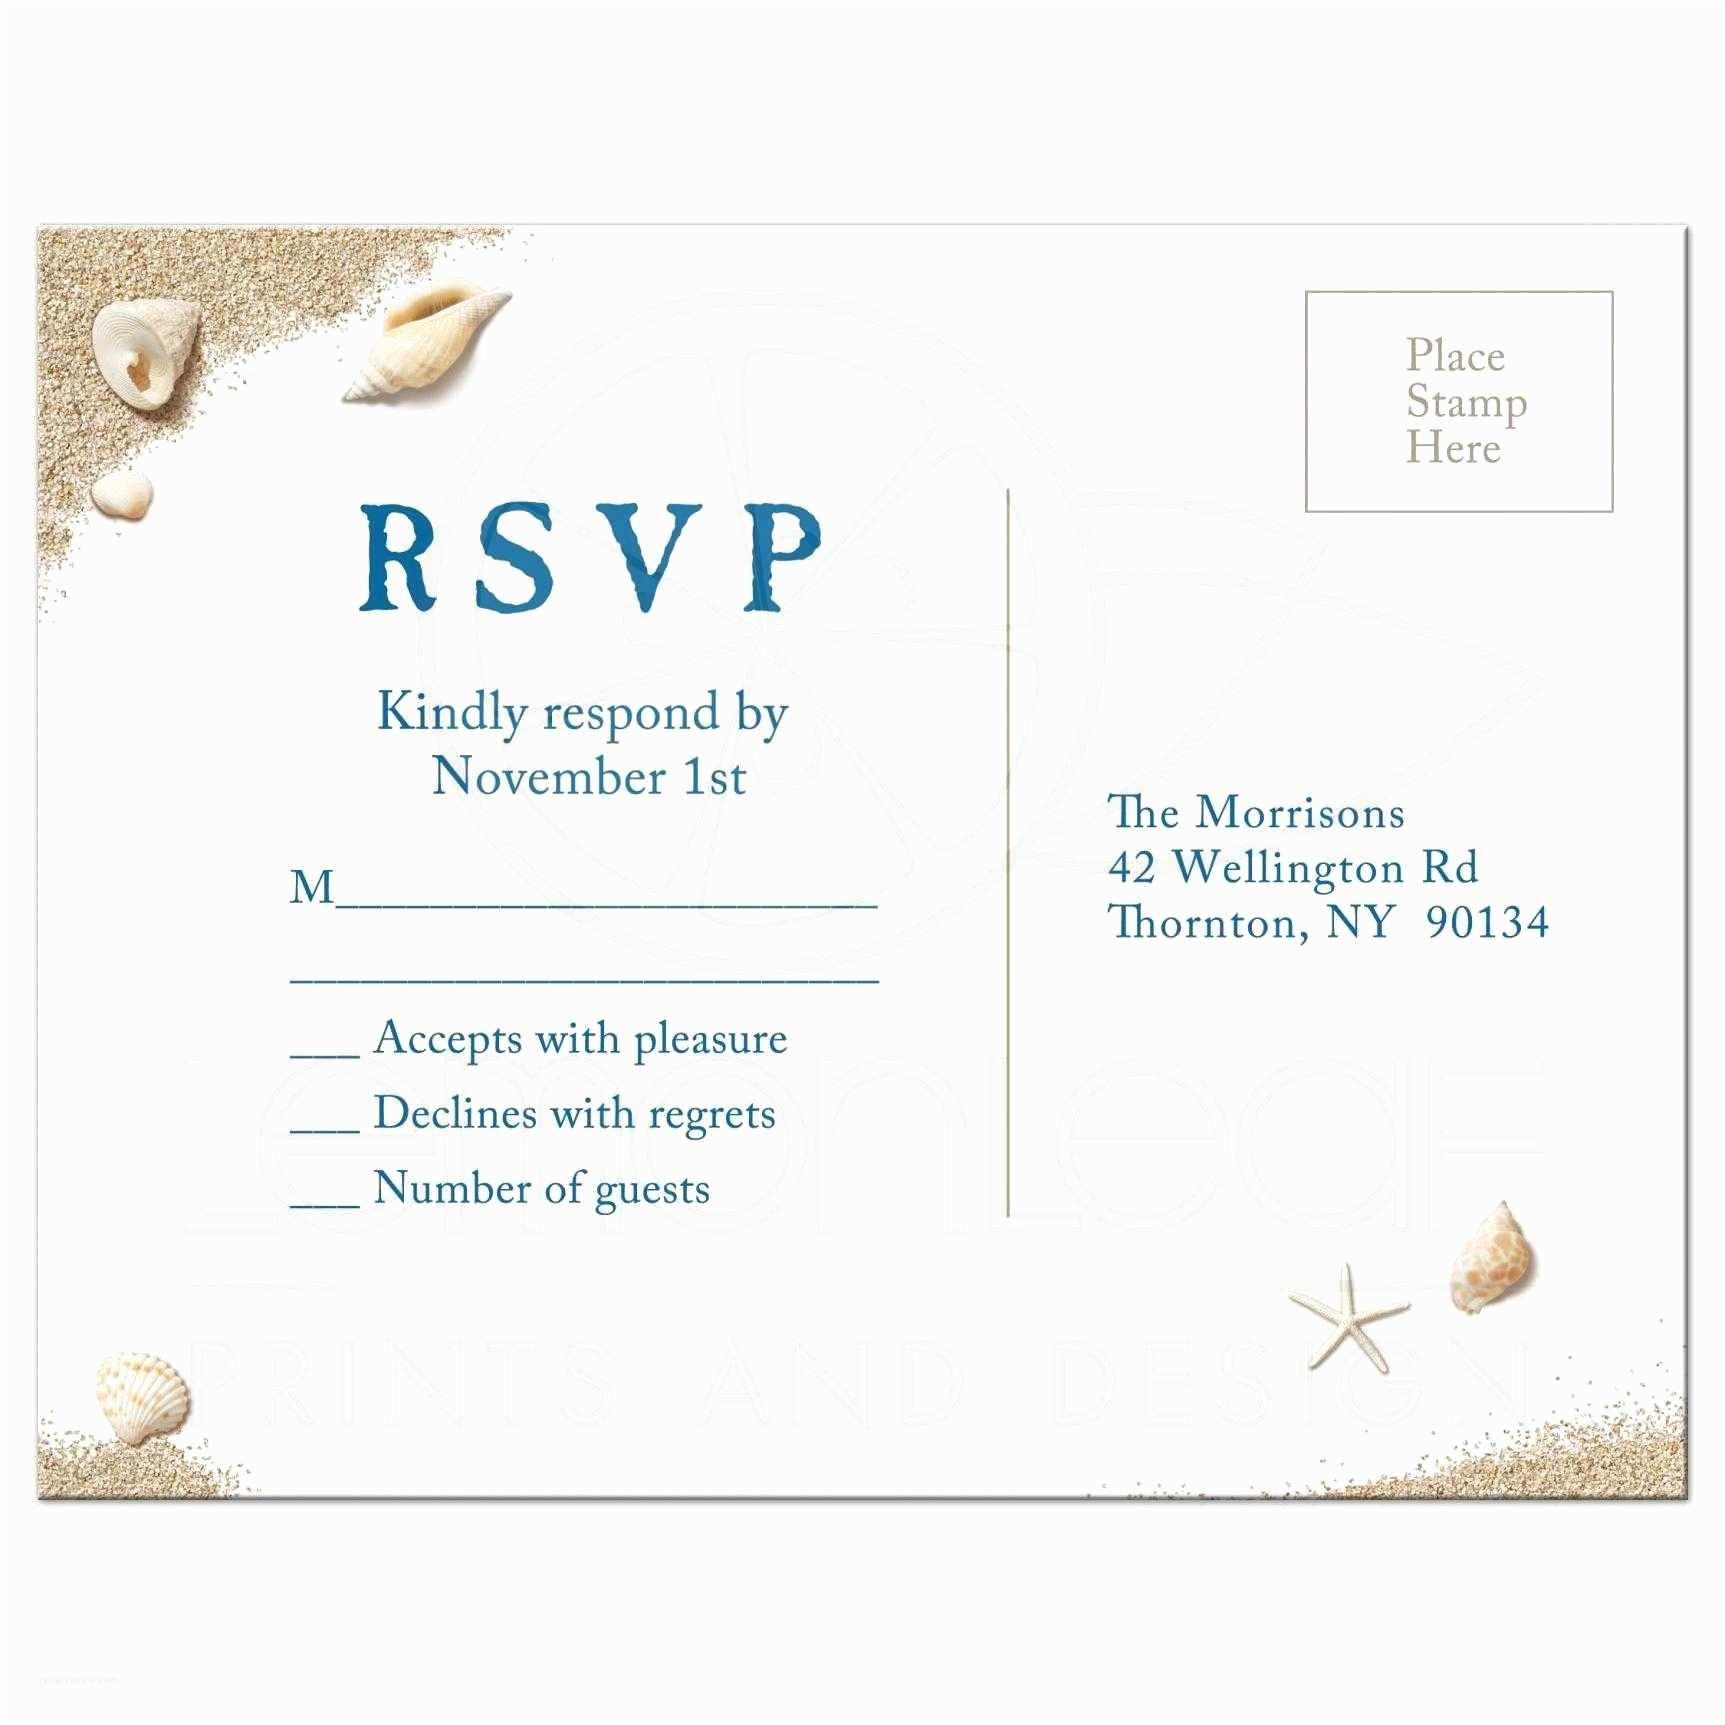 Postcard Wedding Invitations Rsvp Postcard Beach Sandy toes Salty Kisses